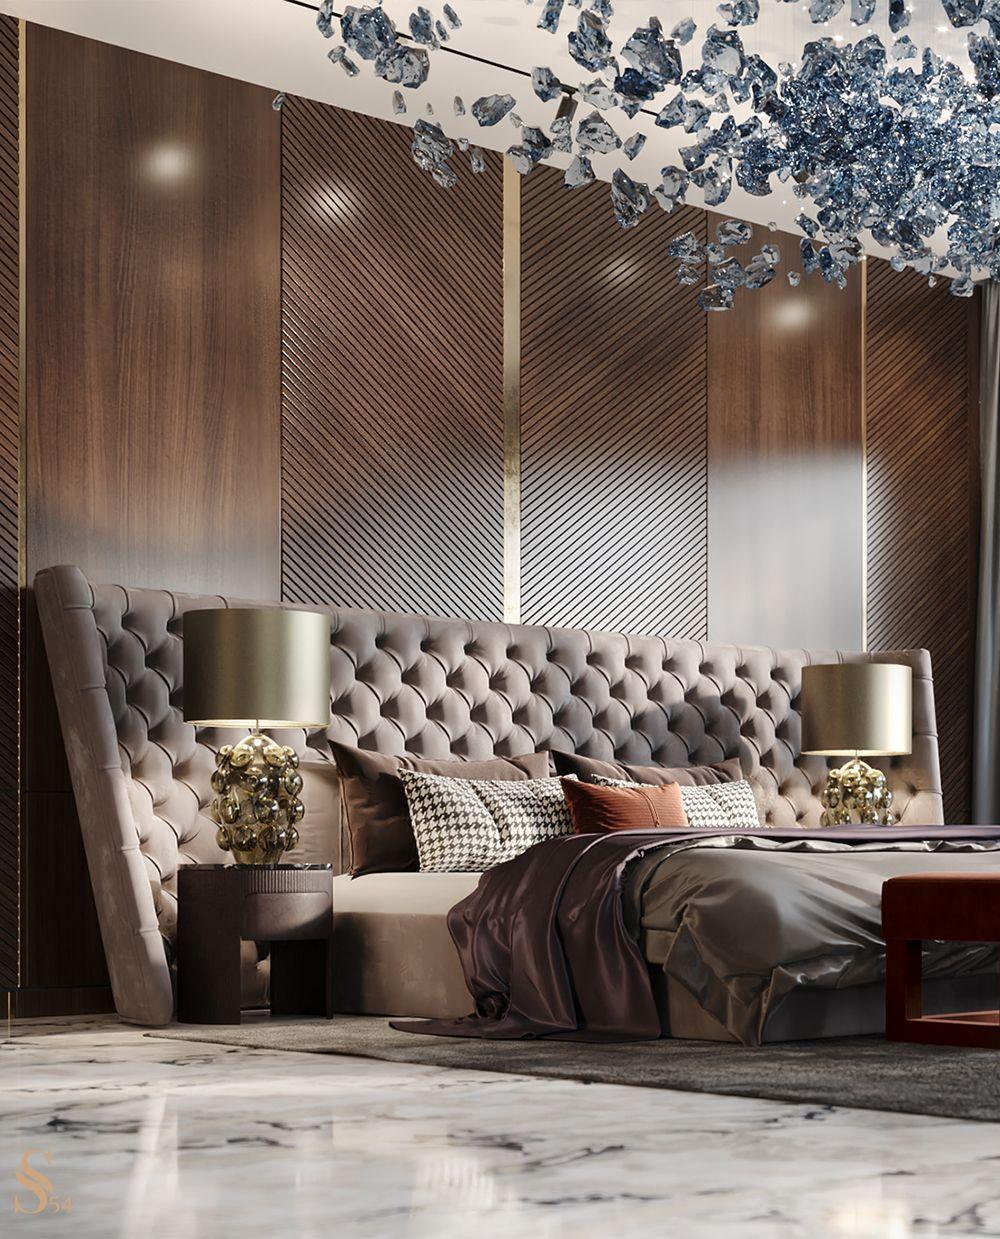 Decor Ideas To Achieve A Marvelous Bedroom Design In 2021 Bedroom Interior Design Luxury Modern Bedroom Interior Luxurious Bedrooms Luxury bedroom design 2021